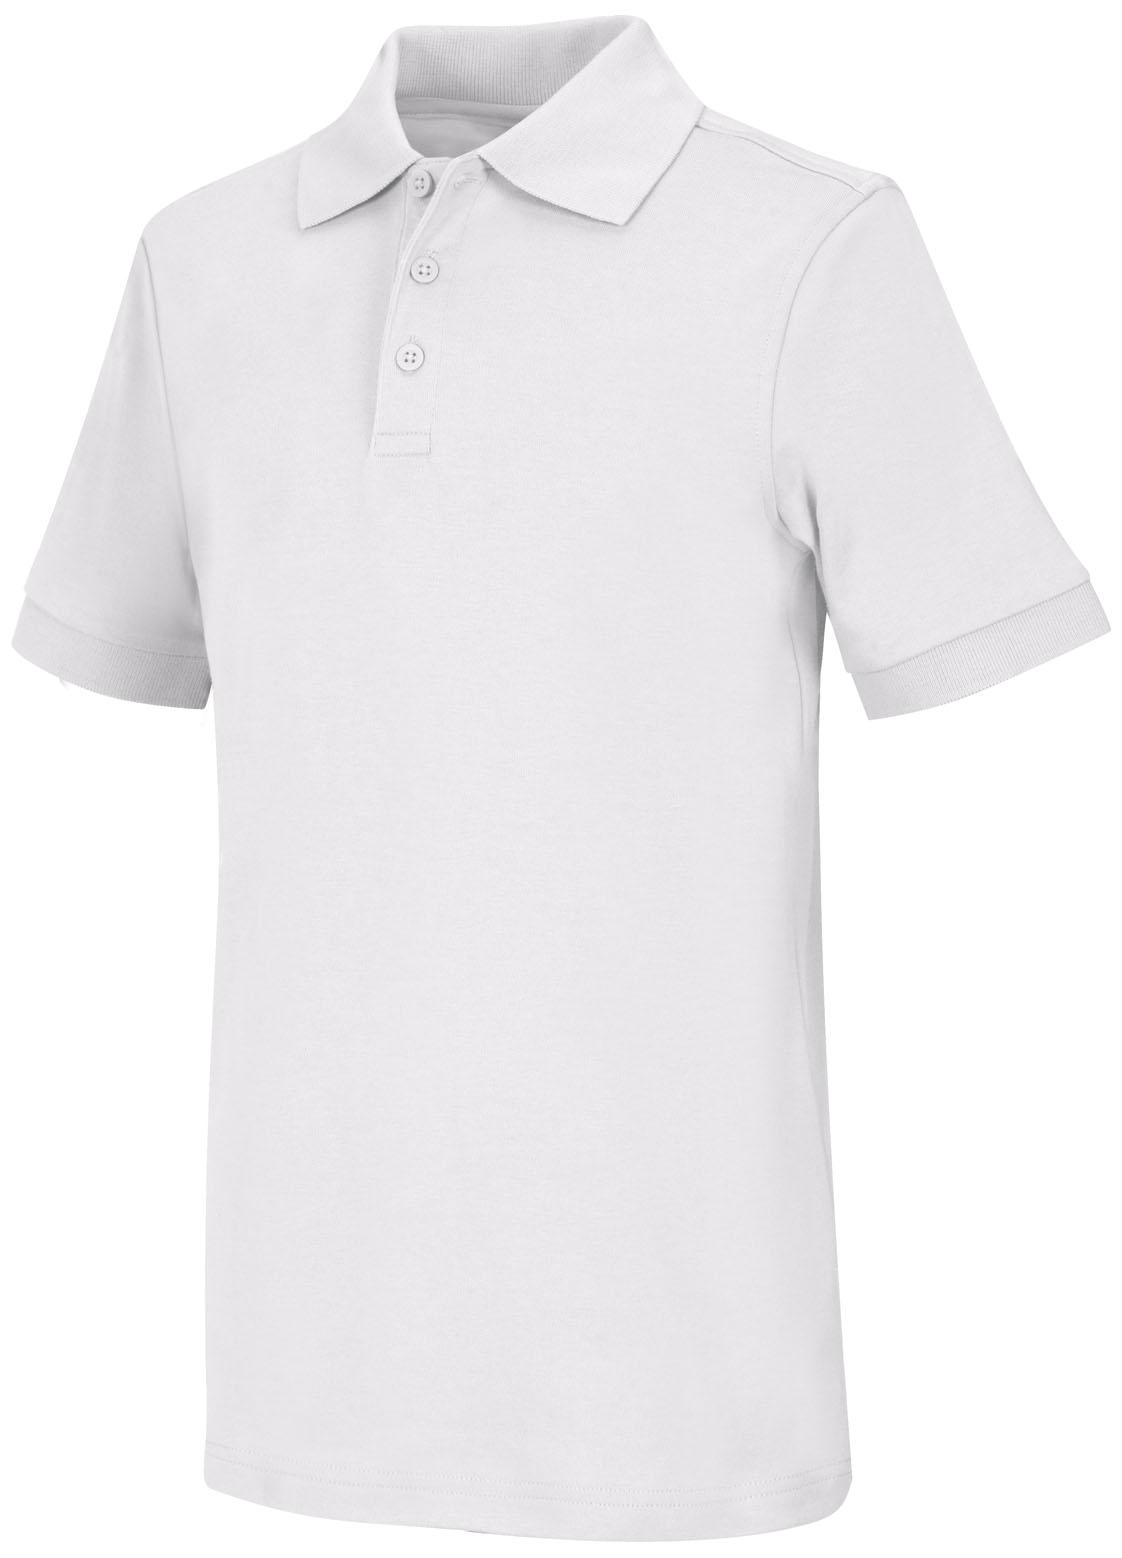 58830 Classroom Uniforms Youth Short Sleeve Matching Collar Polo Shirt